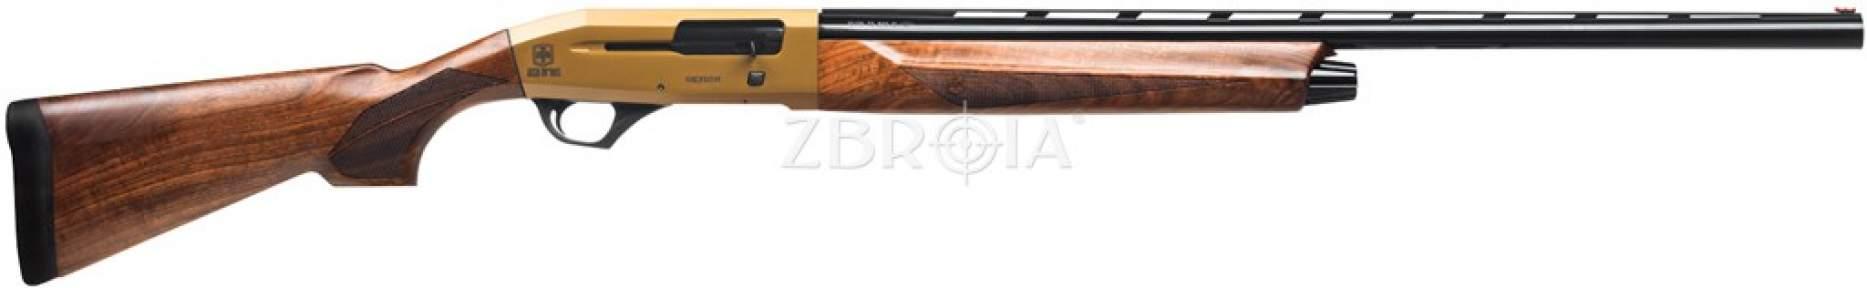 Ружье Ata Arms Venza Bronze кал. 12/76